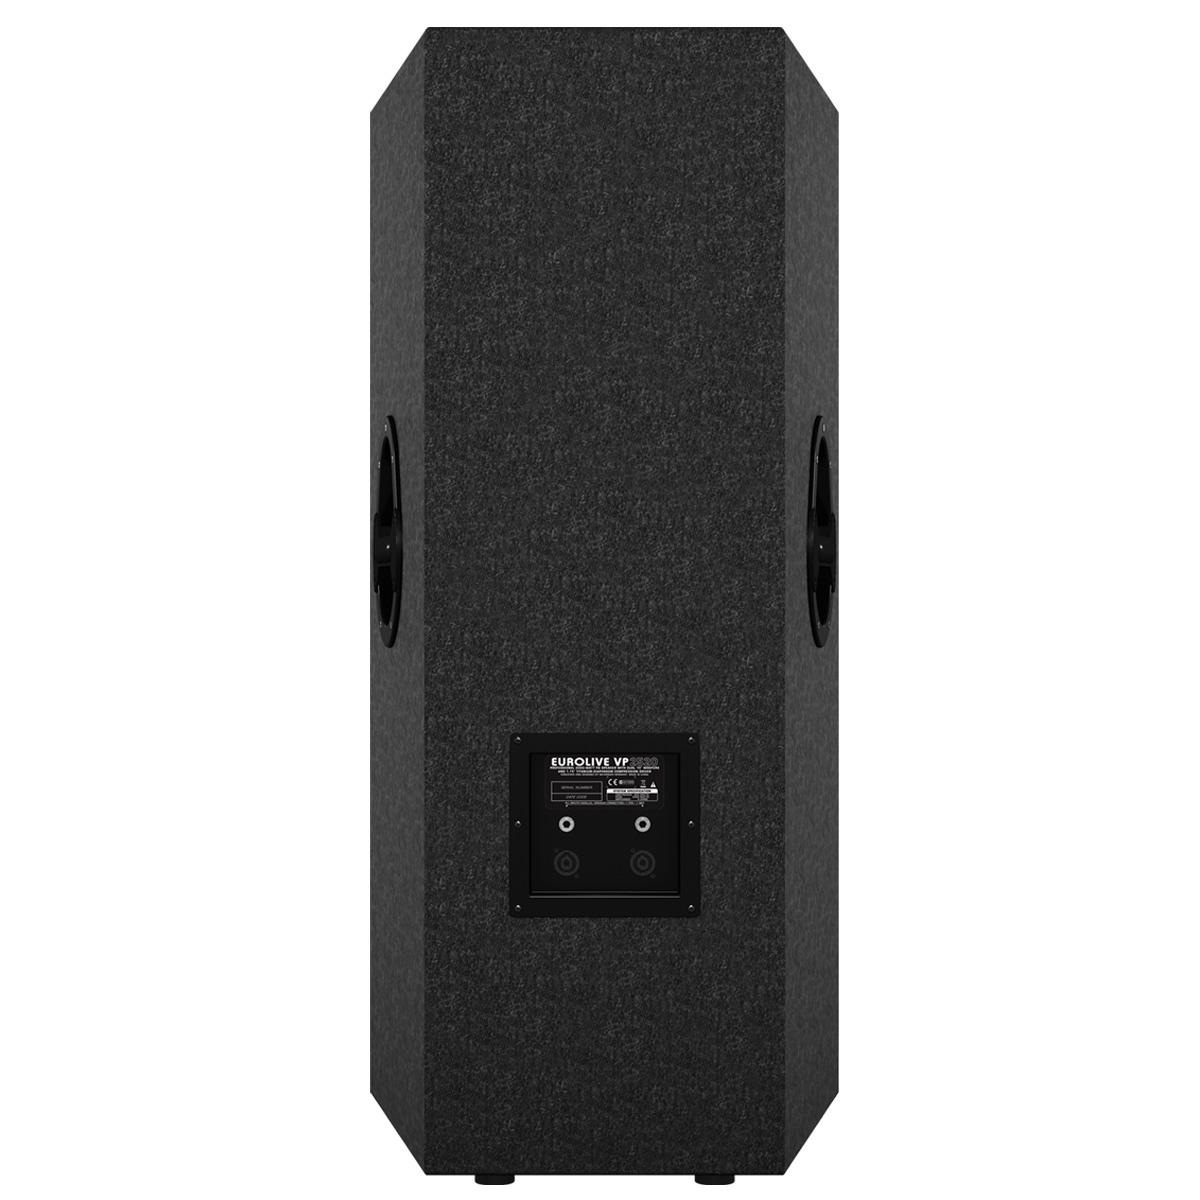 VP2520 - Caixa Passiva 500W Eurolive VP 2520 - Behringer